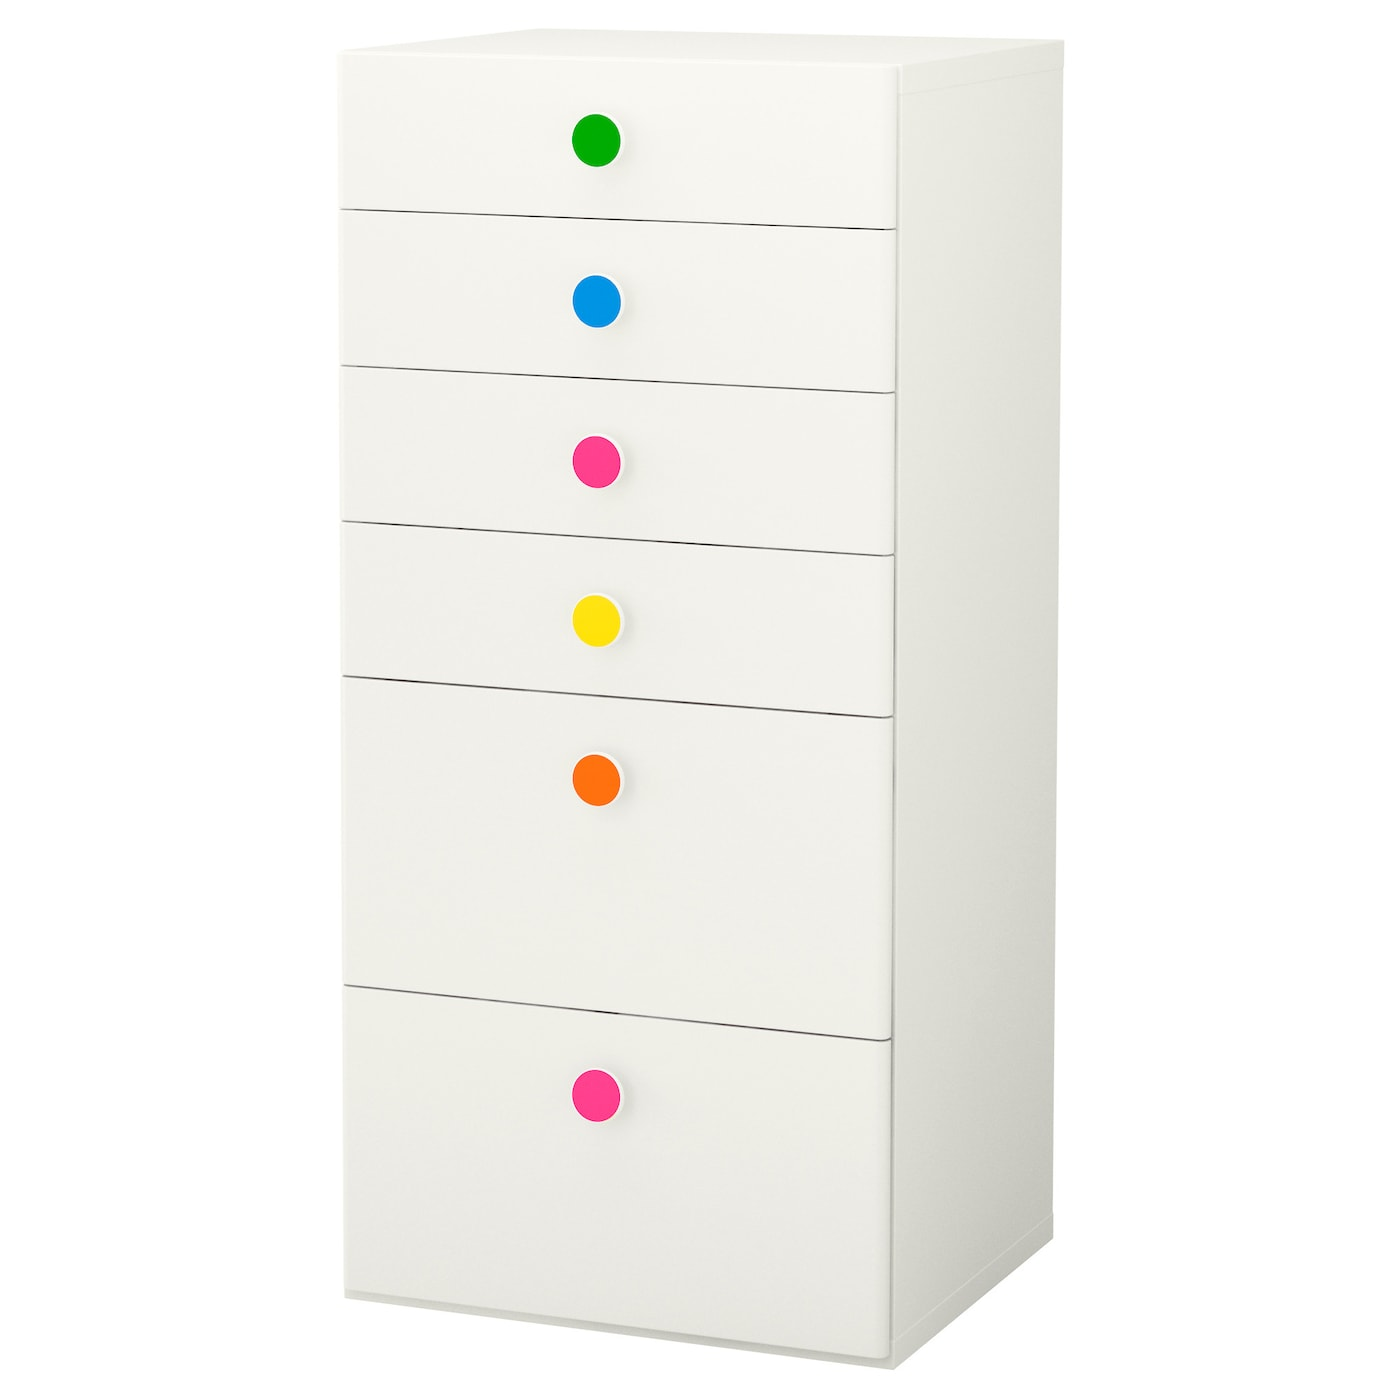 girls white bedroom furniture. IKEA STUVA/FÖLJA Storage Combination With Drawers Girls White Bedroom Furniture